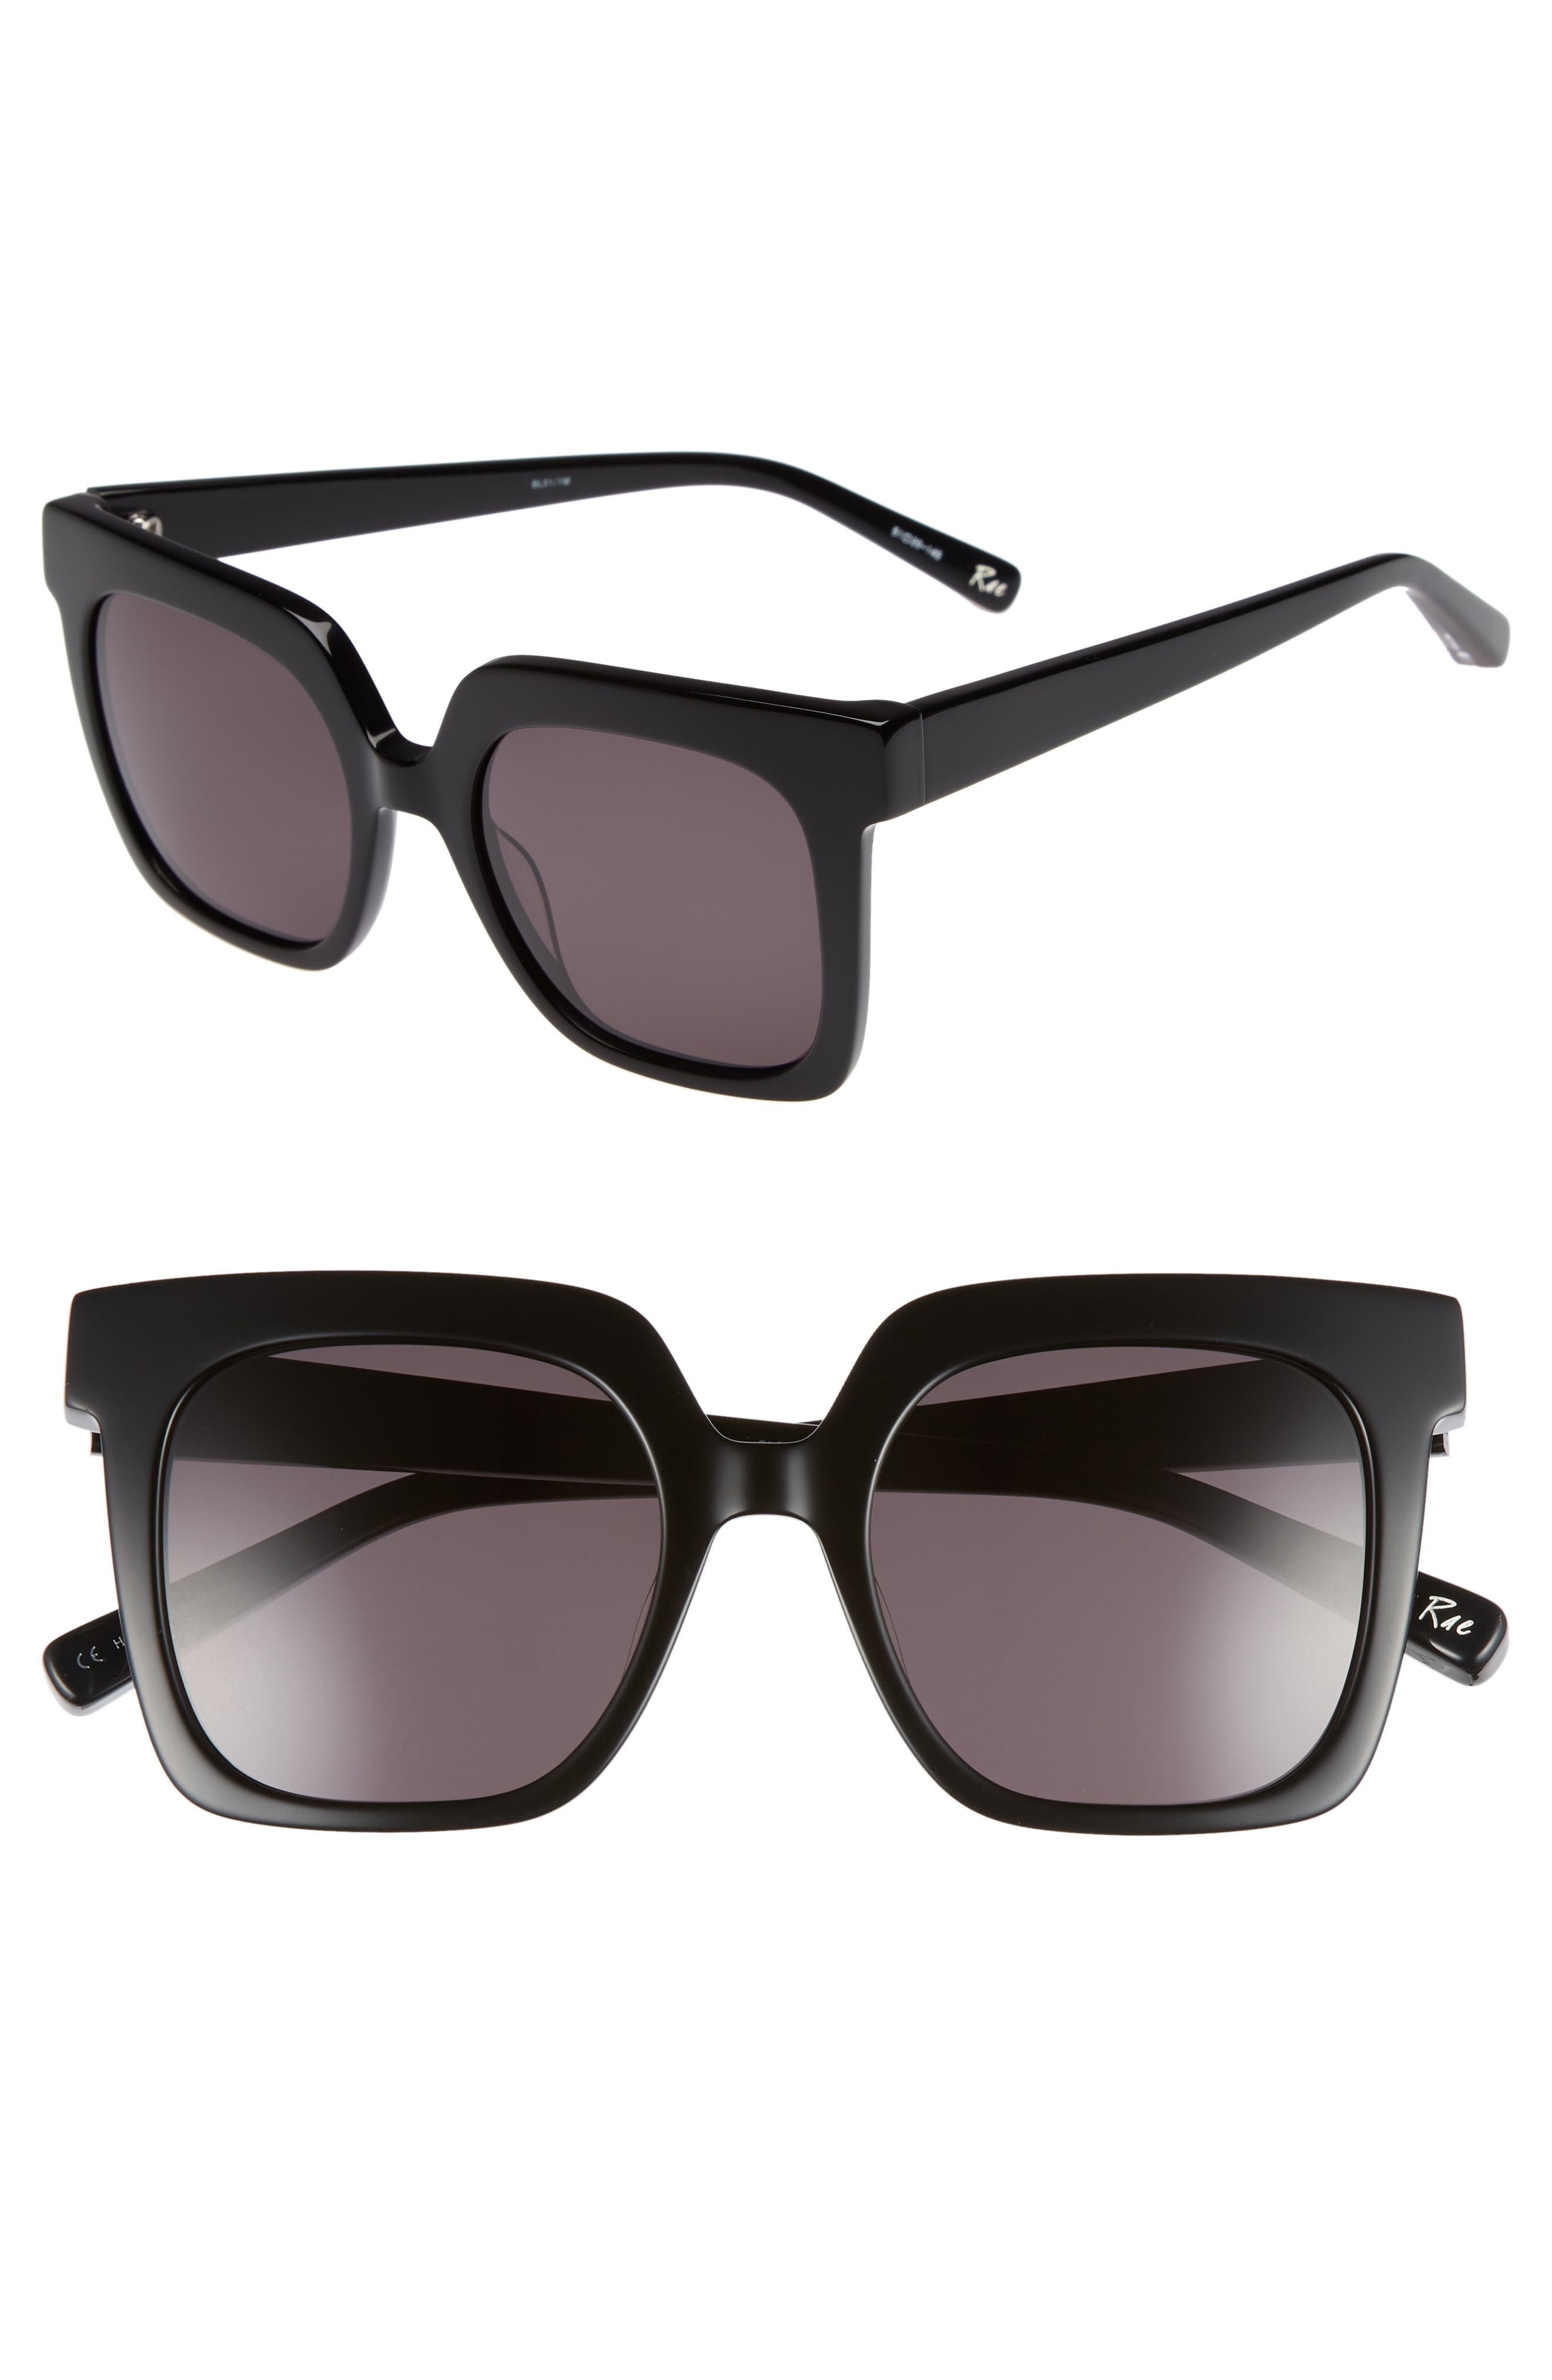 Rae 51mm Square Sunglasses,                             Main thumbnail 1, color,